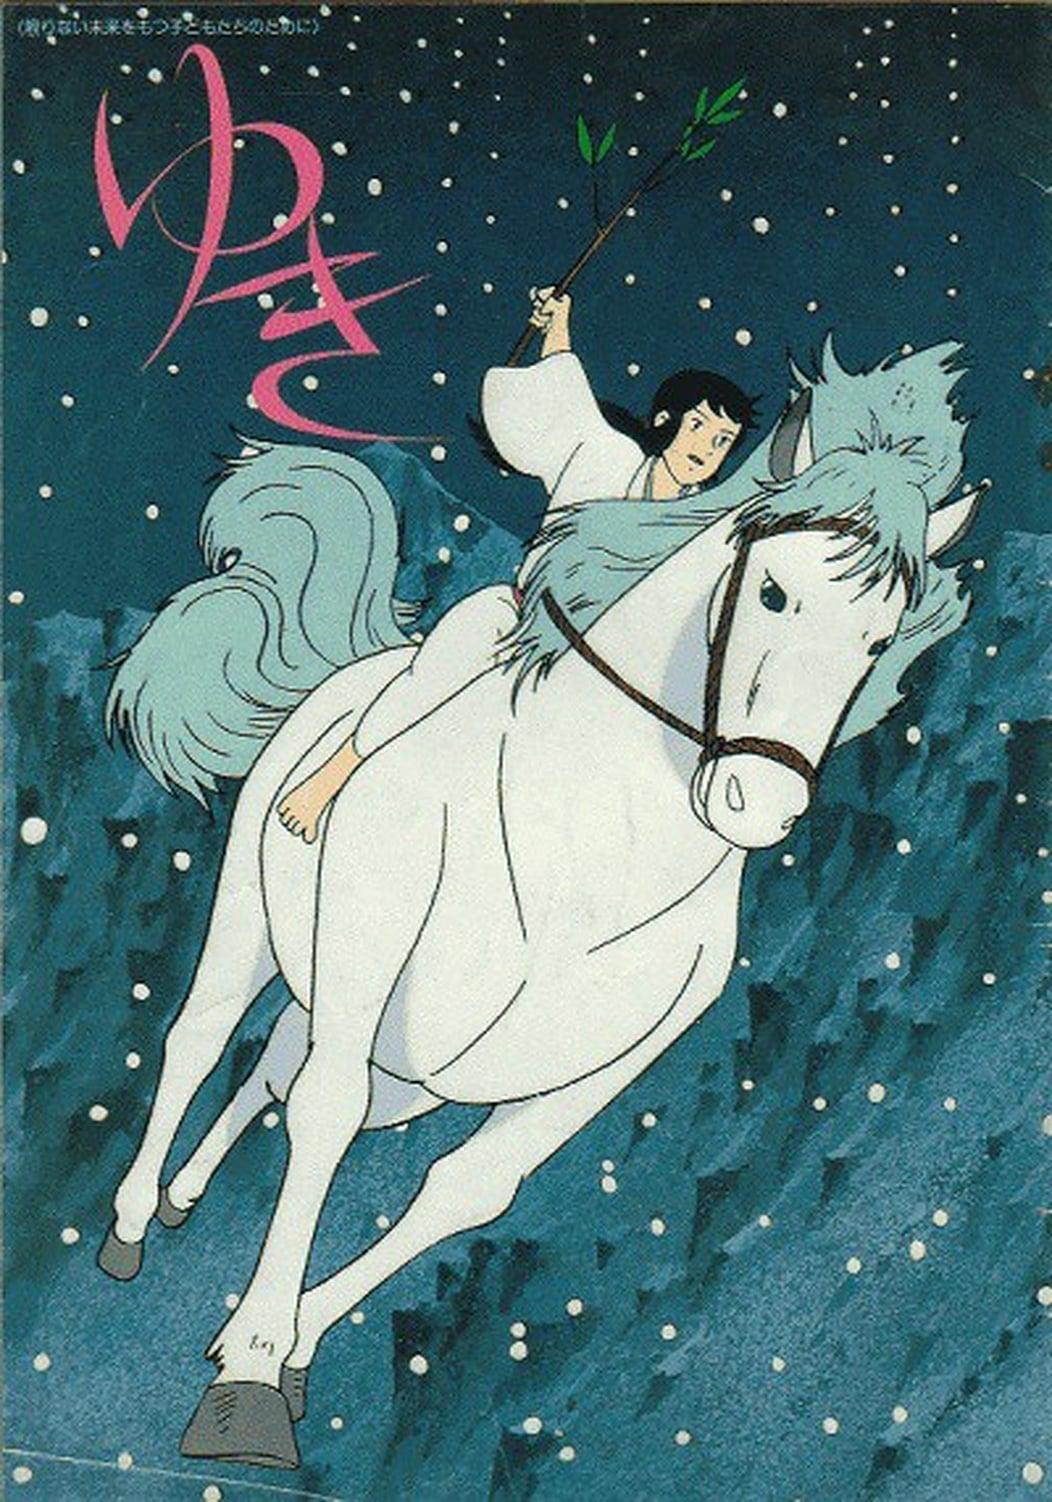 Yuki: The Snow Fairy